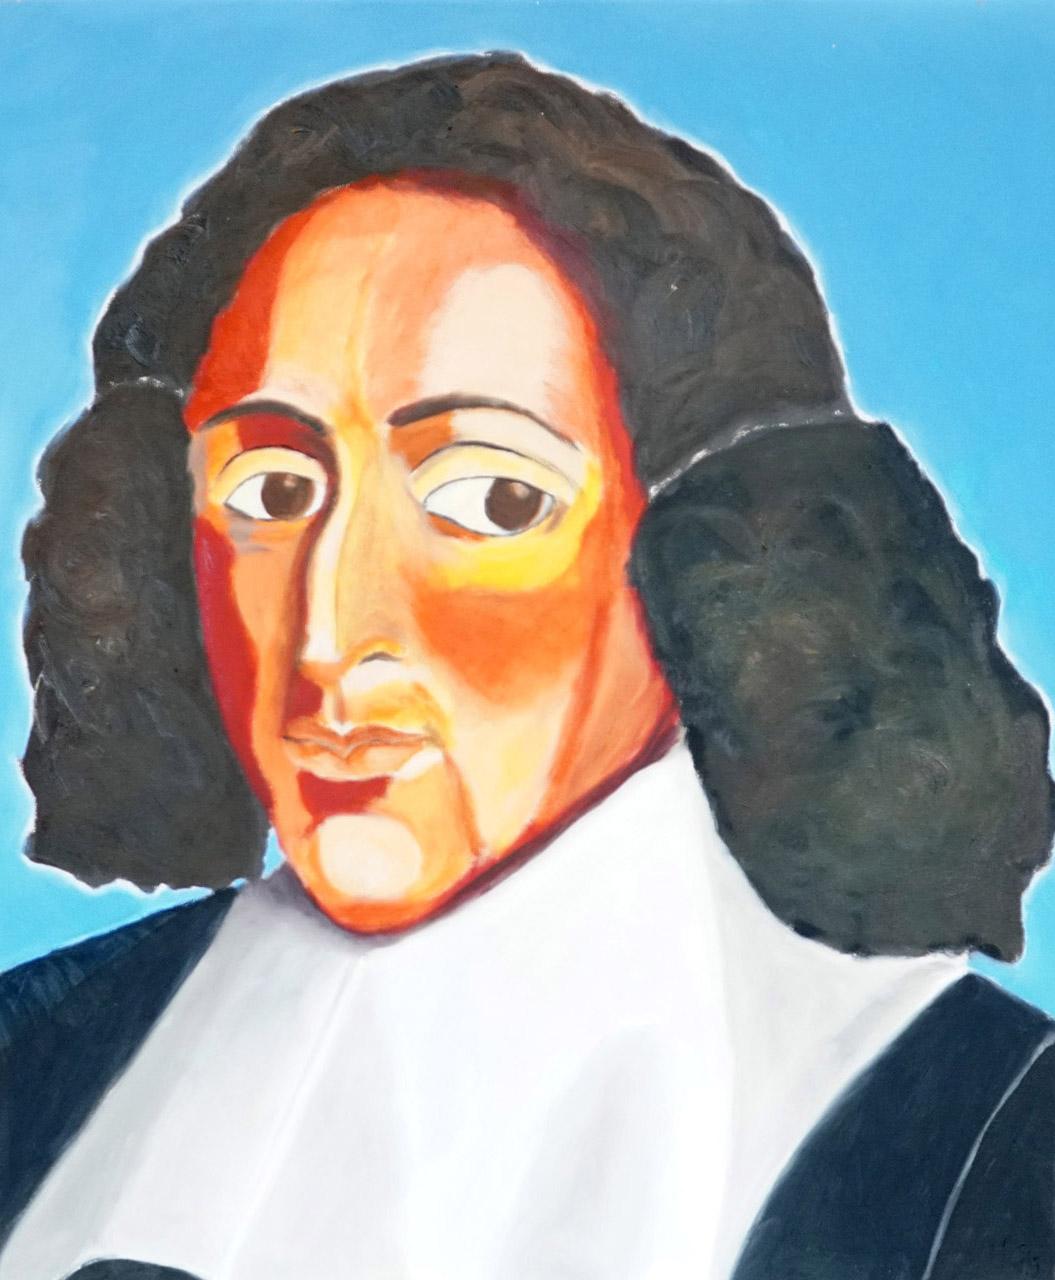 Helma Coumans_Baruch Spinoza, uit de serie dwarse pegels_Olieverf op doek_50x60